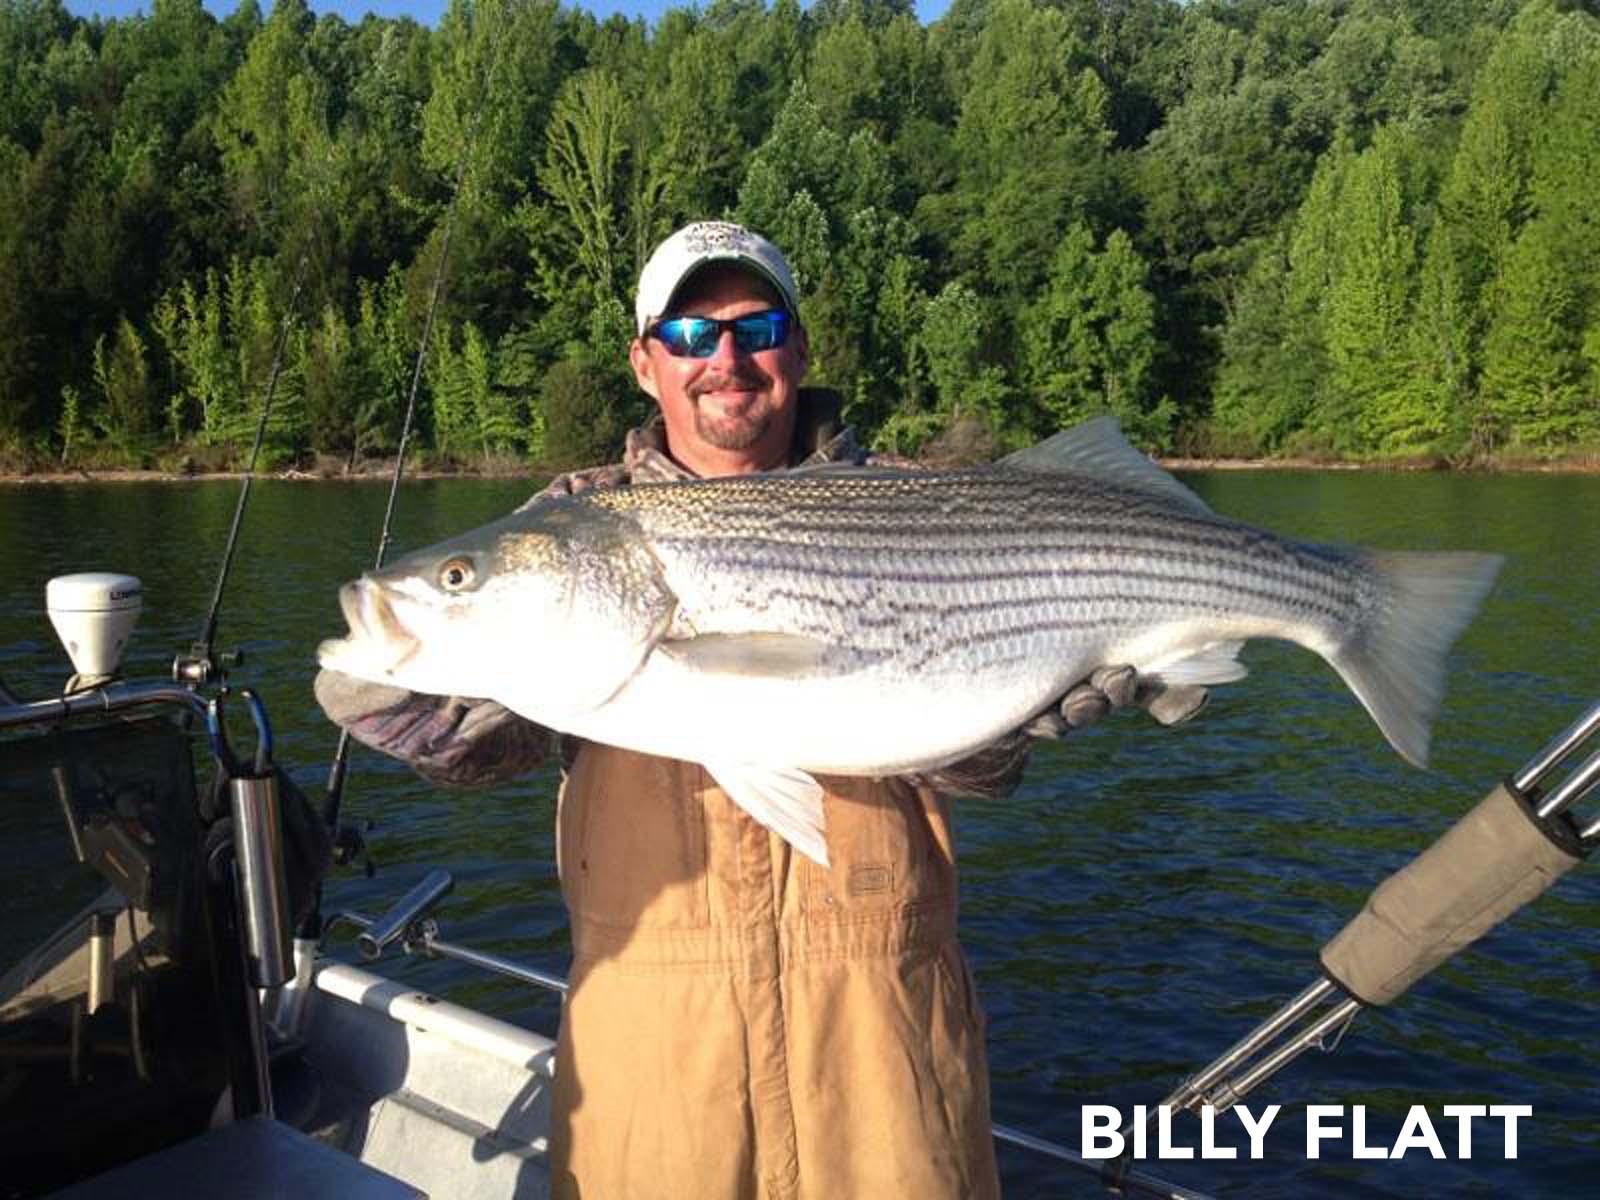 Billy flatt fishing guide 2 nashville fishing charters for Tims ford lake fishing report